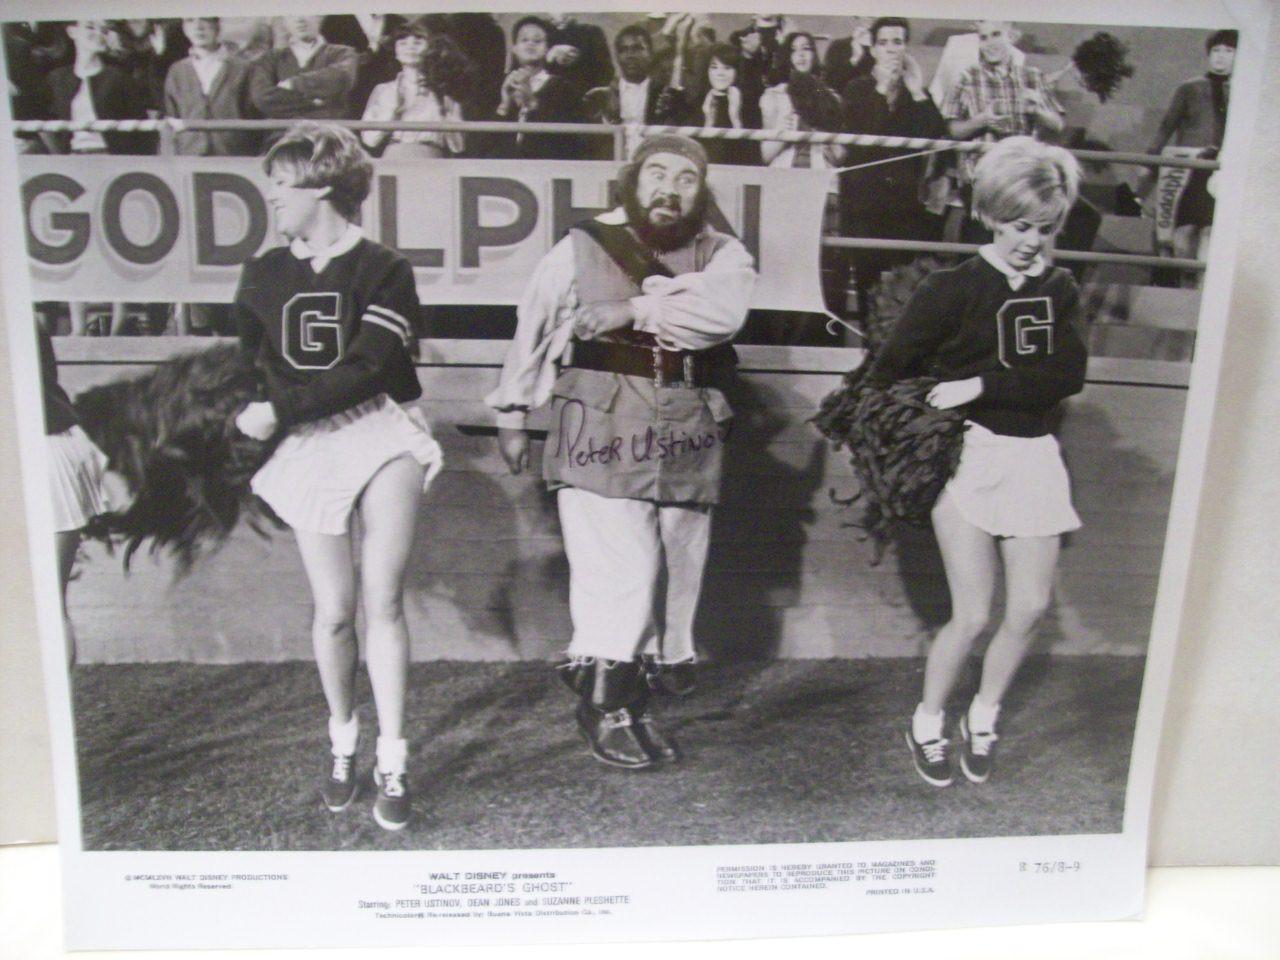 Ustinov, Peter Photo Signed Autograph Blackbeard'S Ghost Walt Disney 1977